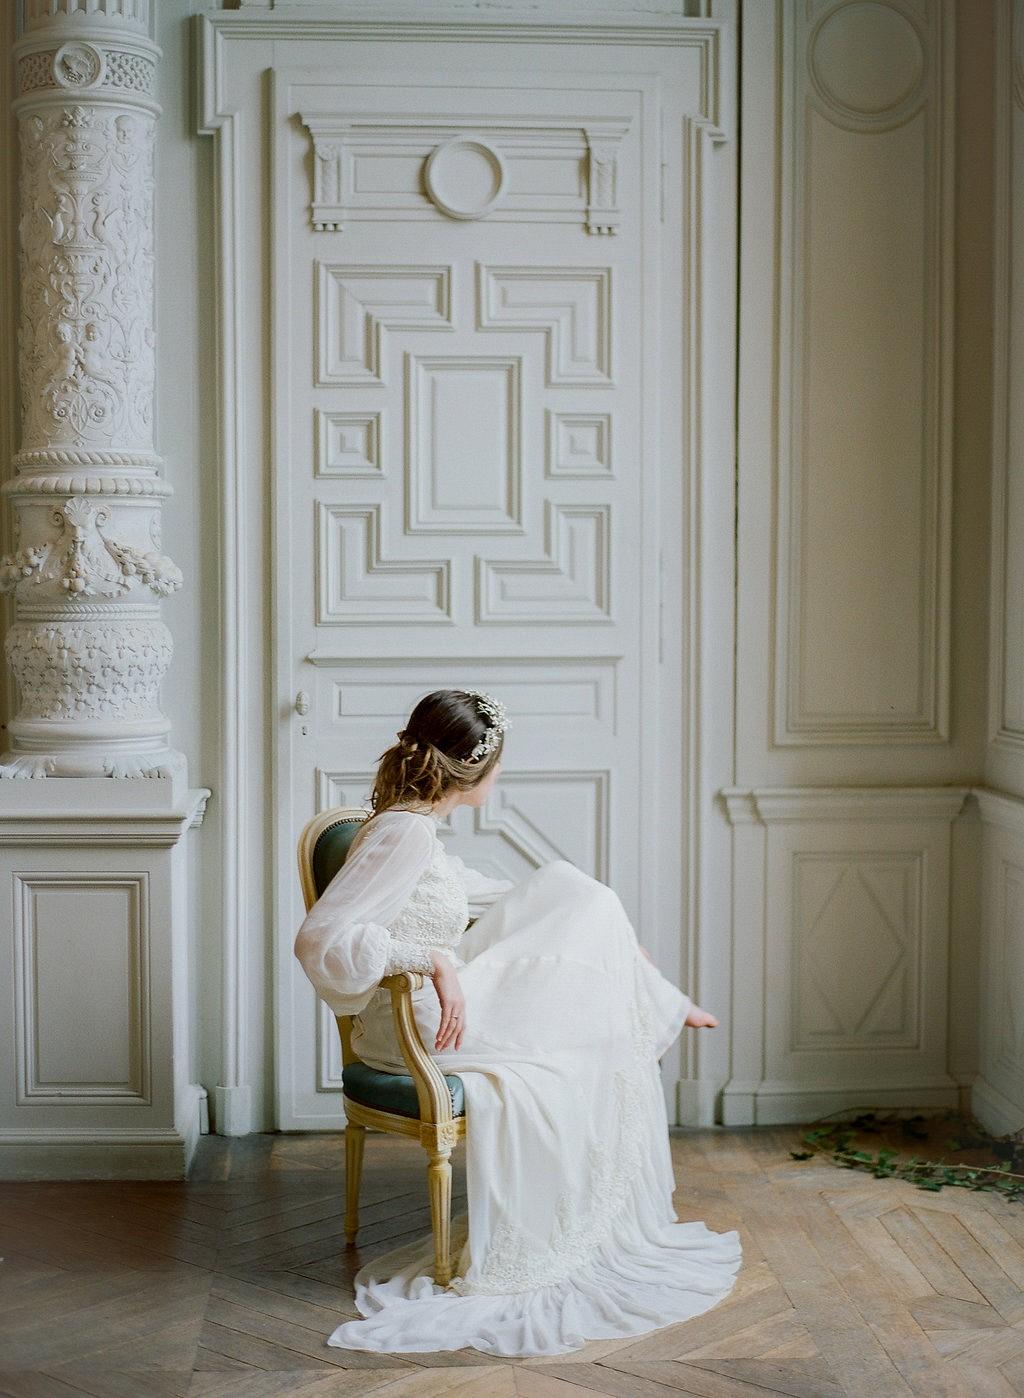 Elegant Wedding at Chateau de Boursault in France